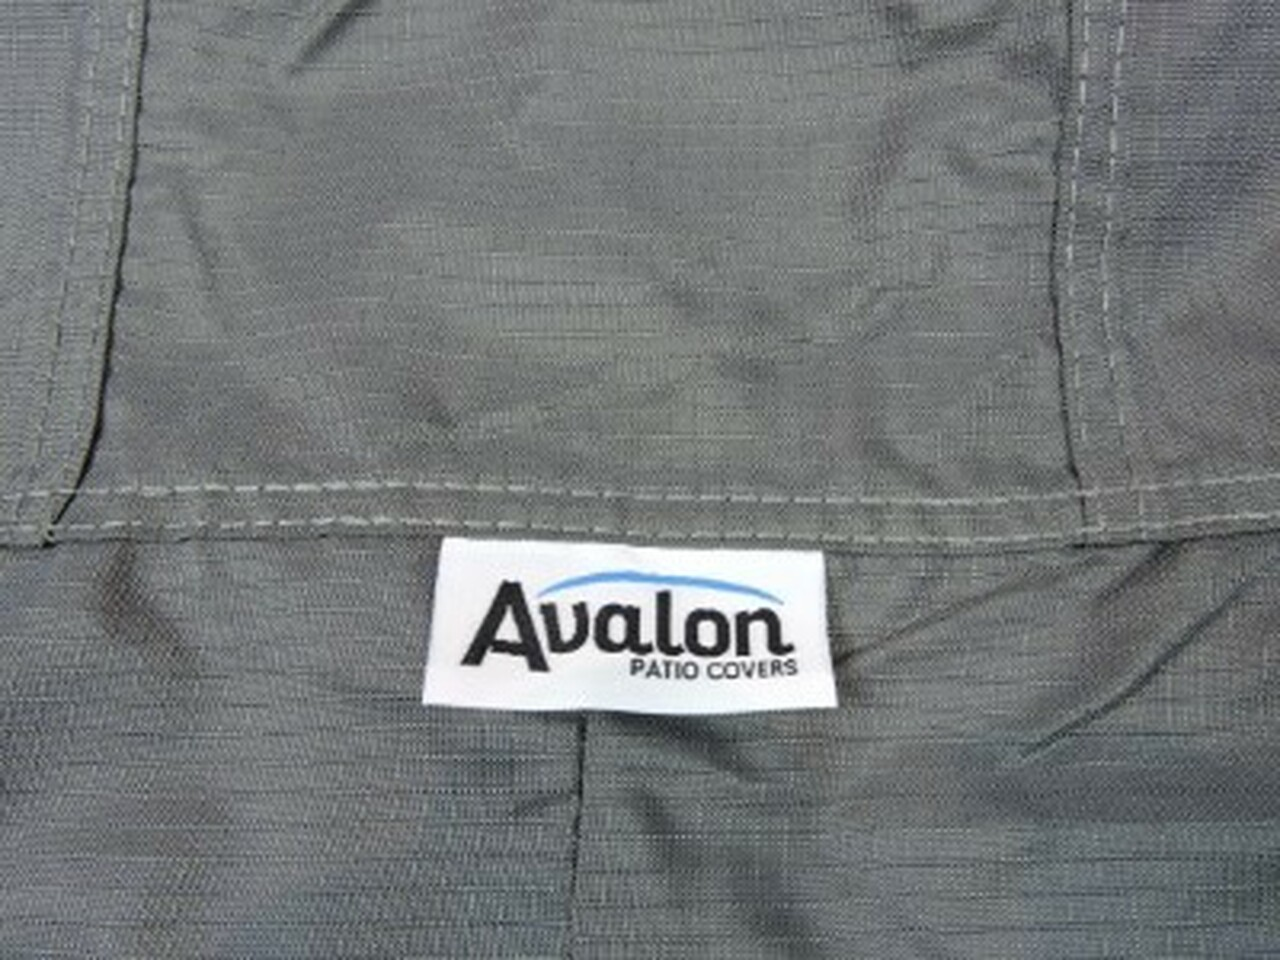 Round Day Bed (73Wx22Hx32H) (Avalon #51550)